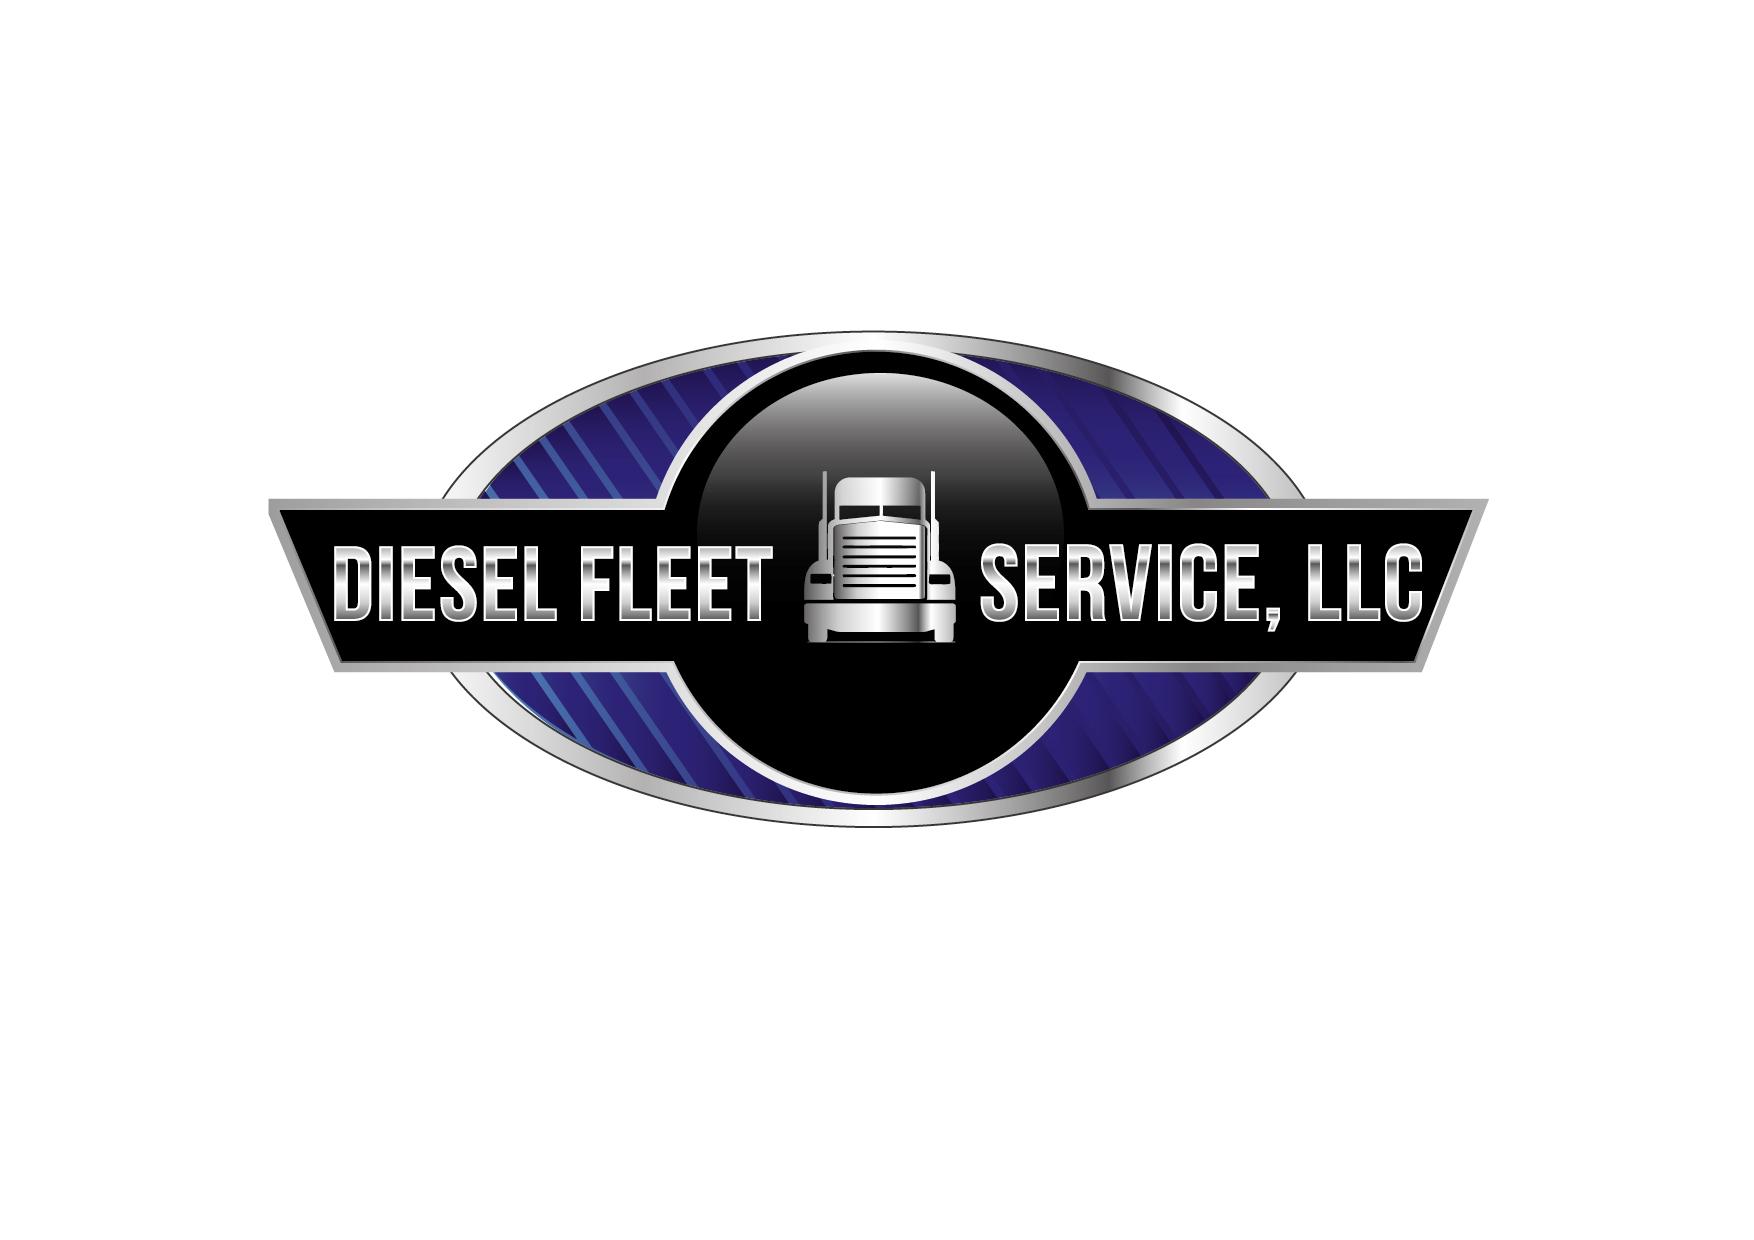 Logo Design by VENTSISLAV KOVACHEV - Entry No. 41 in the Logo Design Contest Artistic Logo Design for Diesel Fleet Service, LLC.